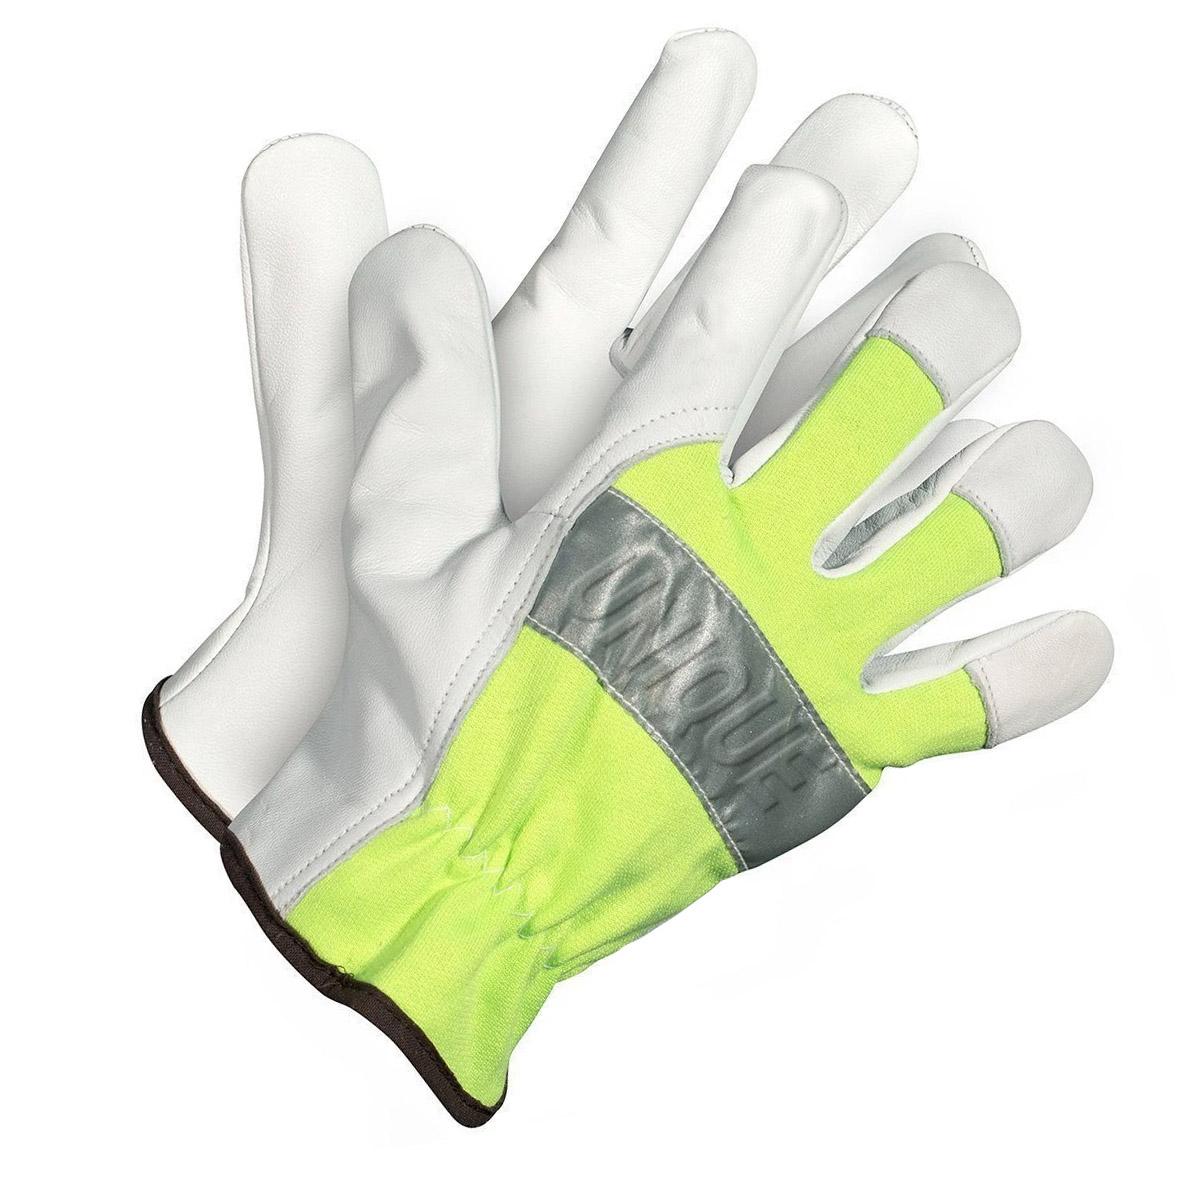 Natural Gaot Skin Leather Driver Glove with Hi-Viz